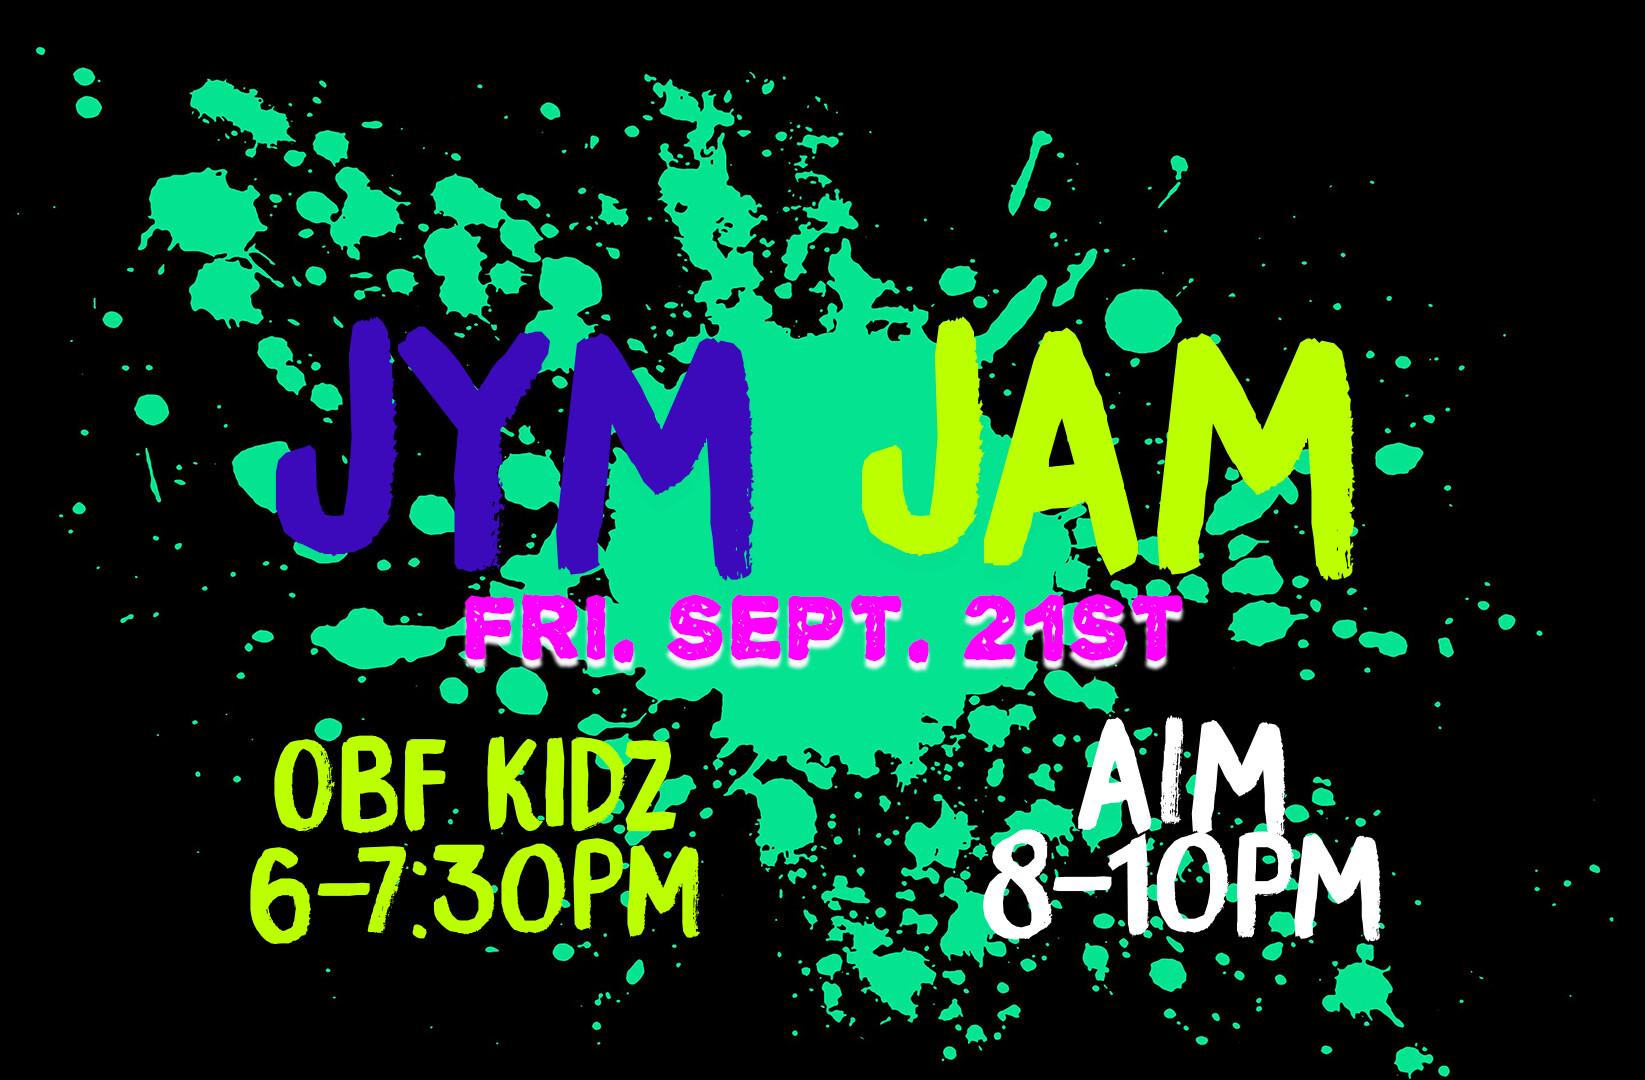 Jym Jam